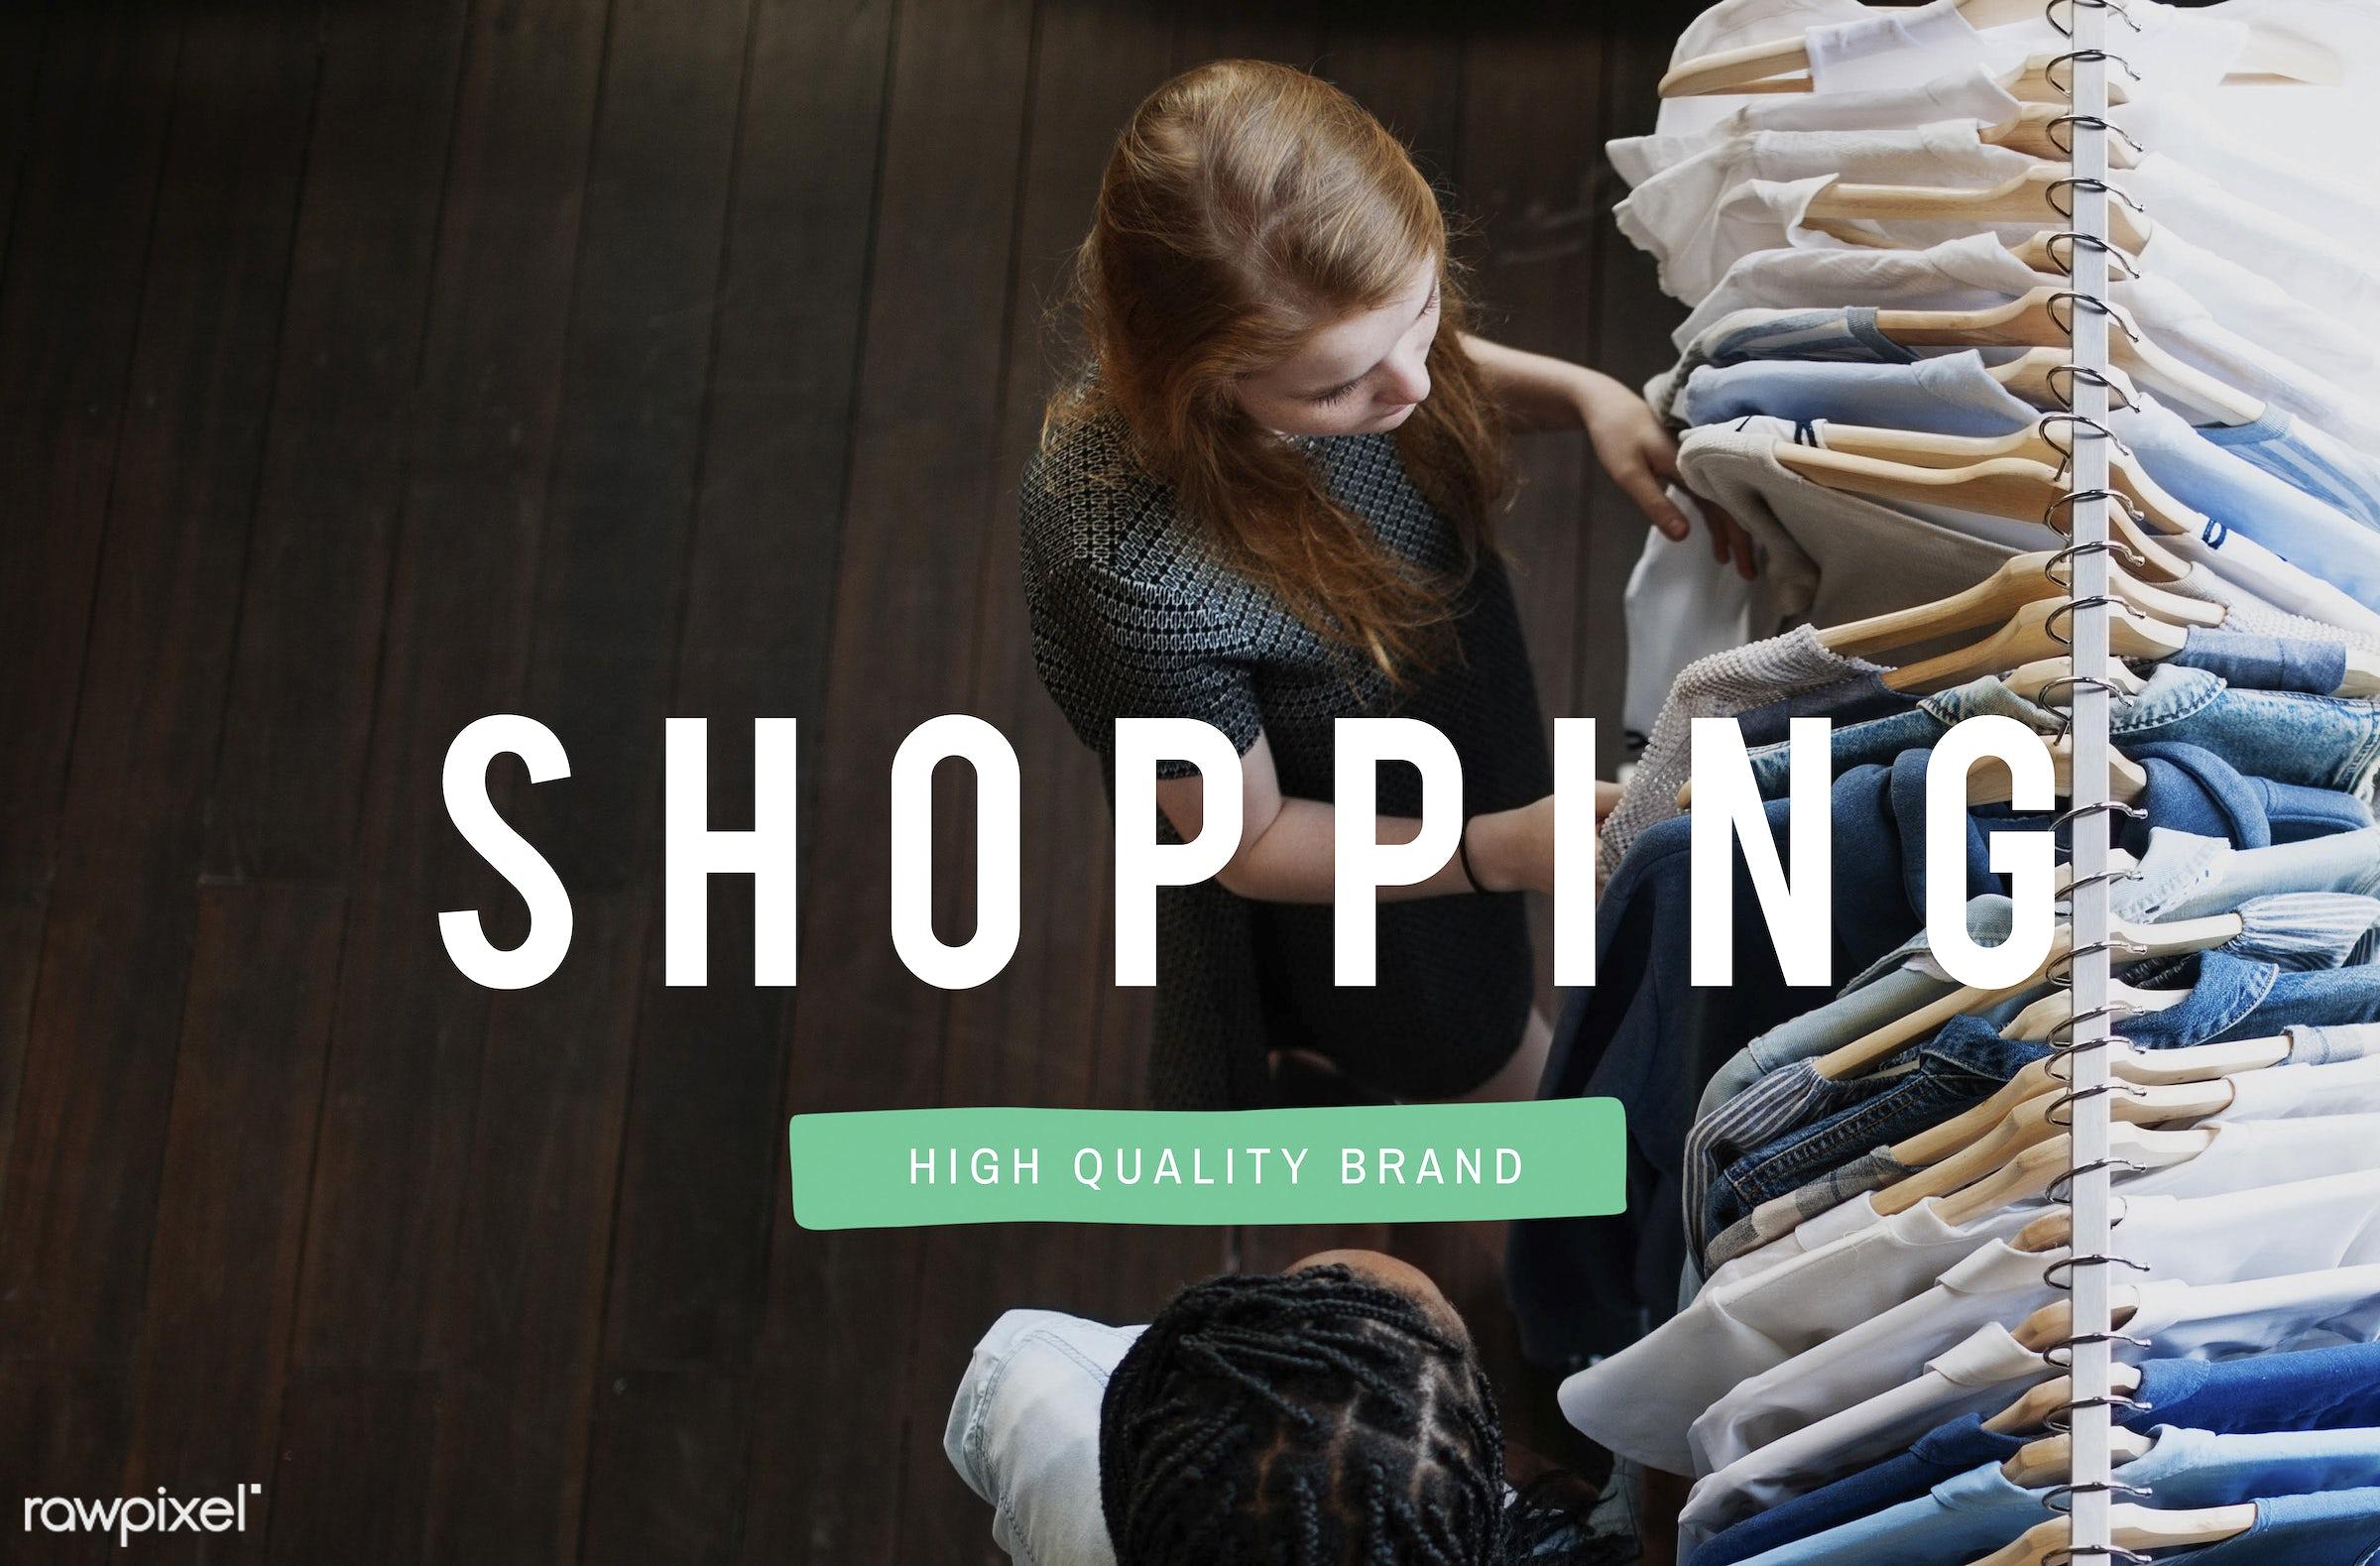 Shopping - shopping, african descent, blue, choosing, clothes, enjoyment, female, fun, hangers, jeans, lifestyle, long hair...